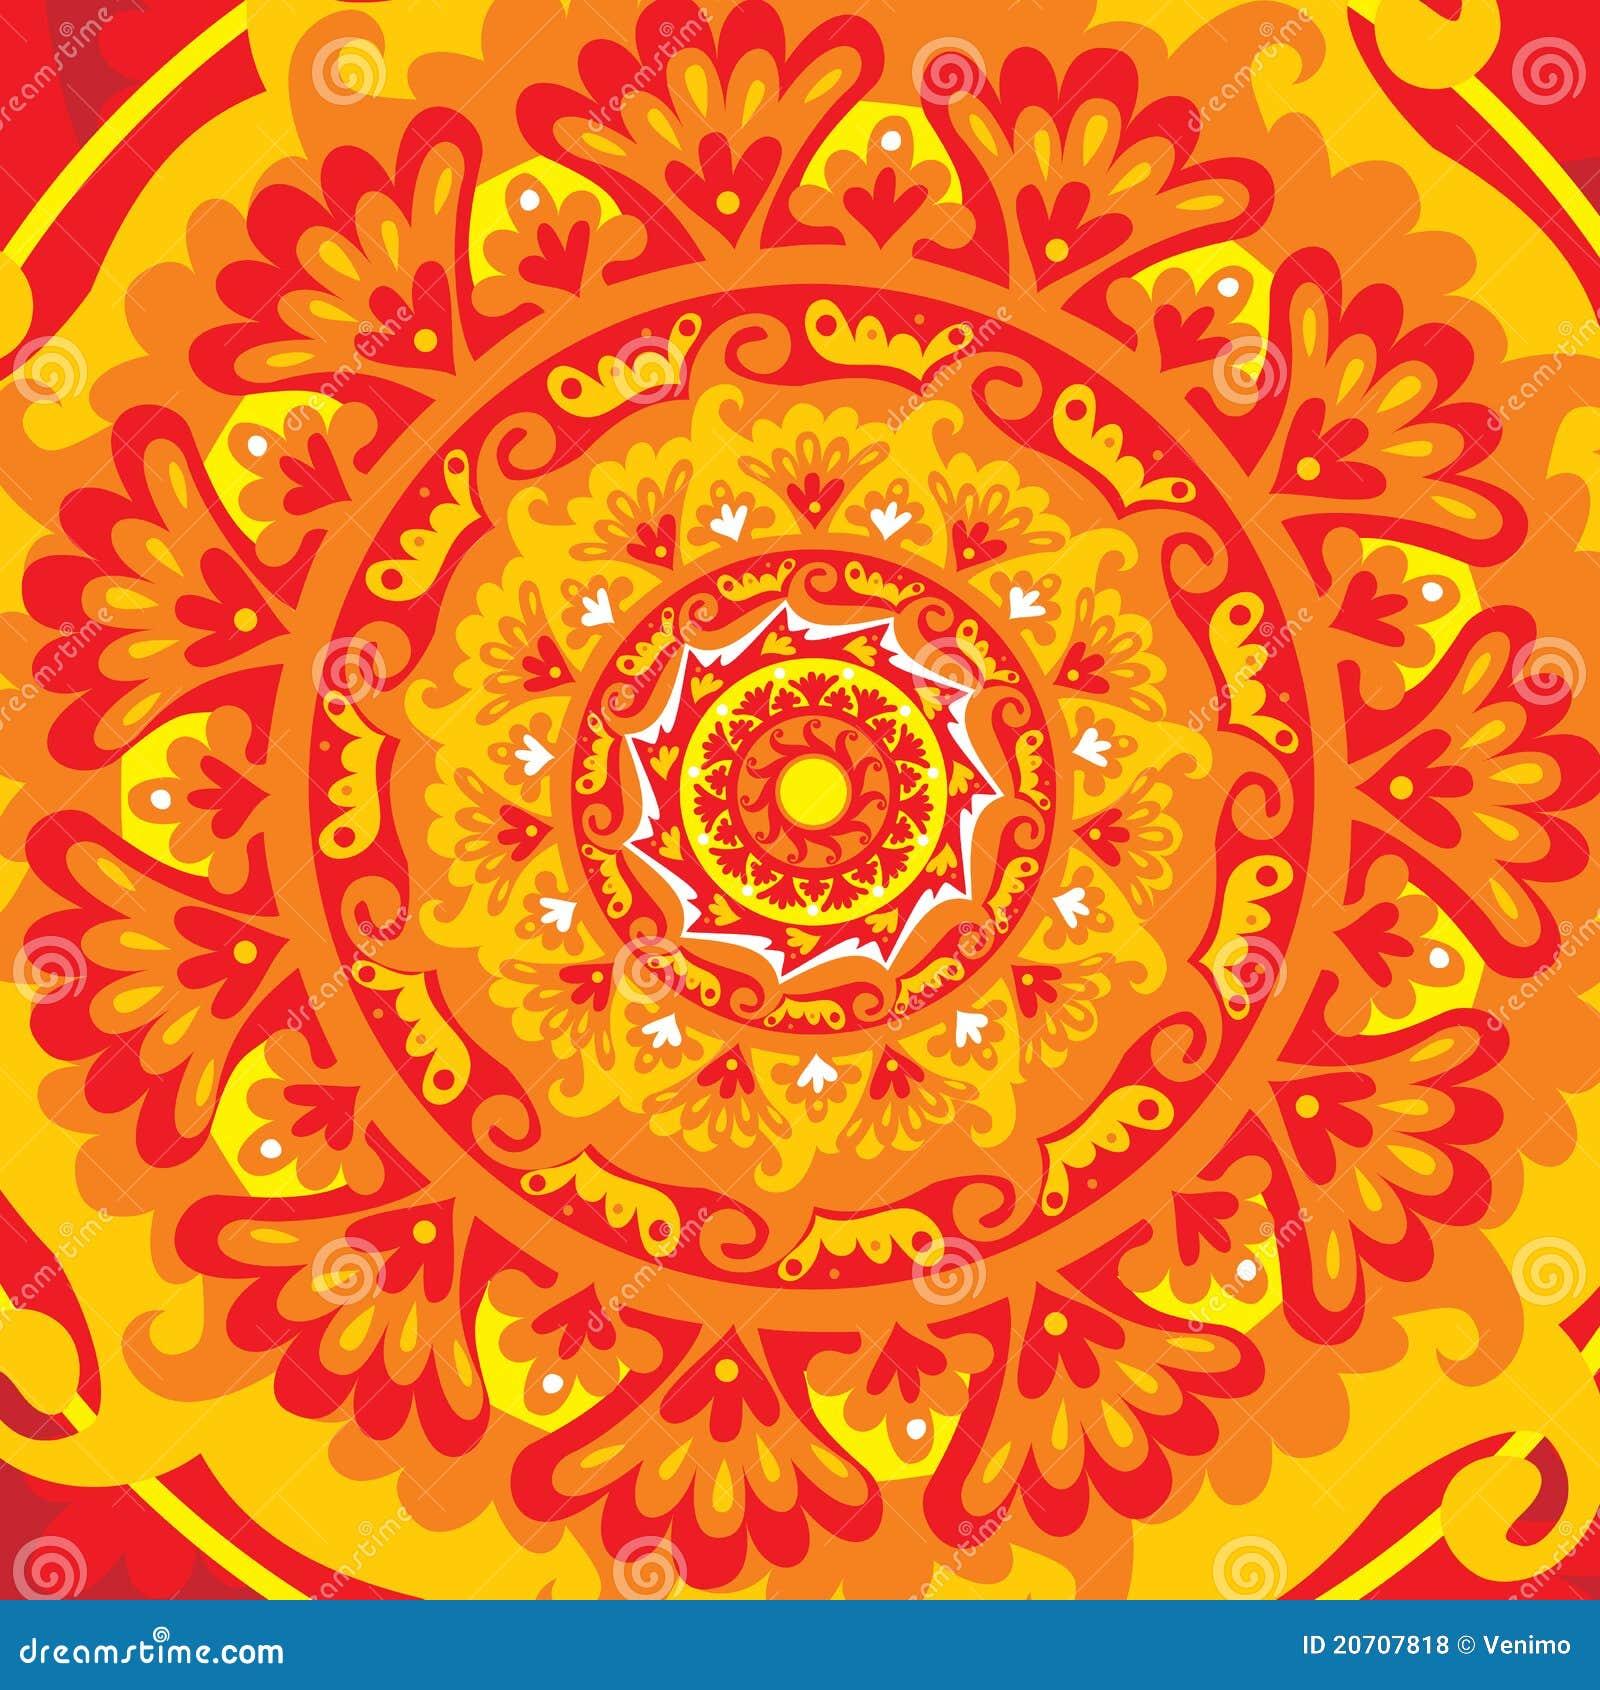 sun mandala royalty free stock photos